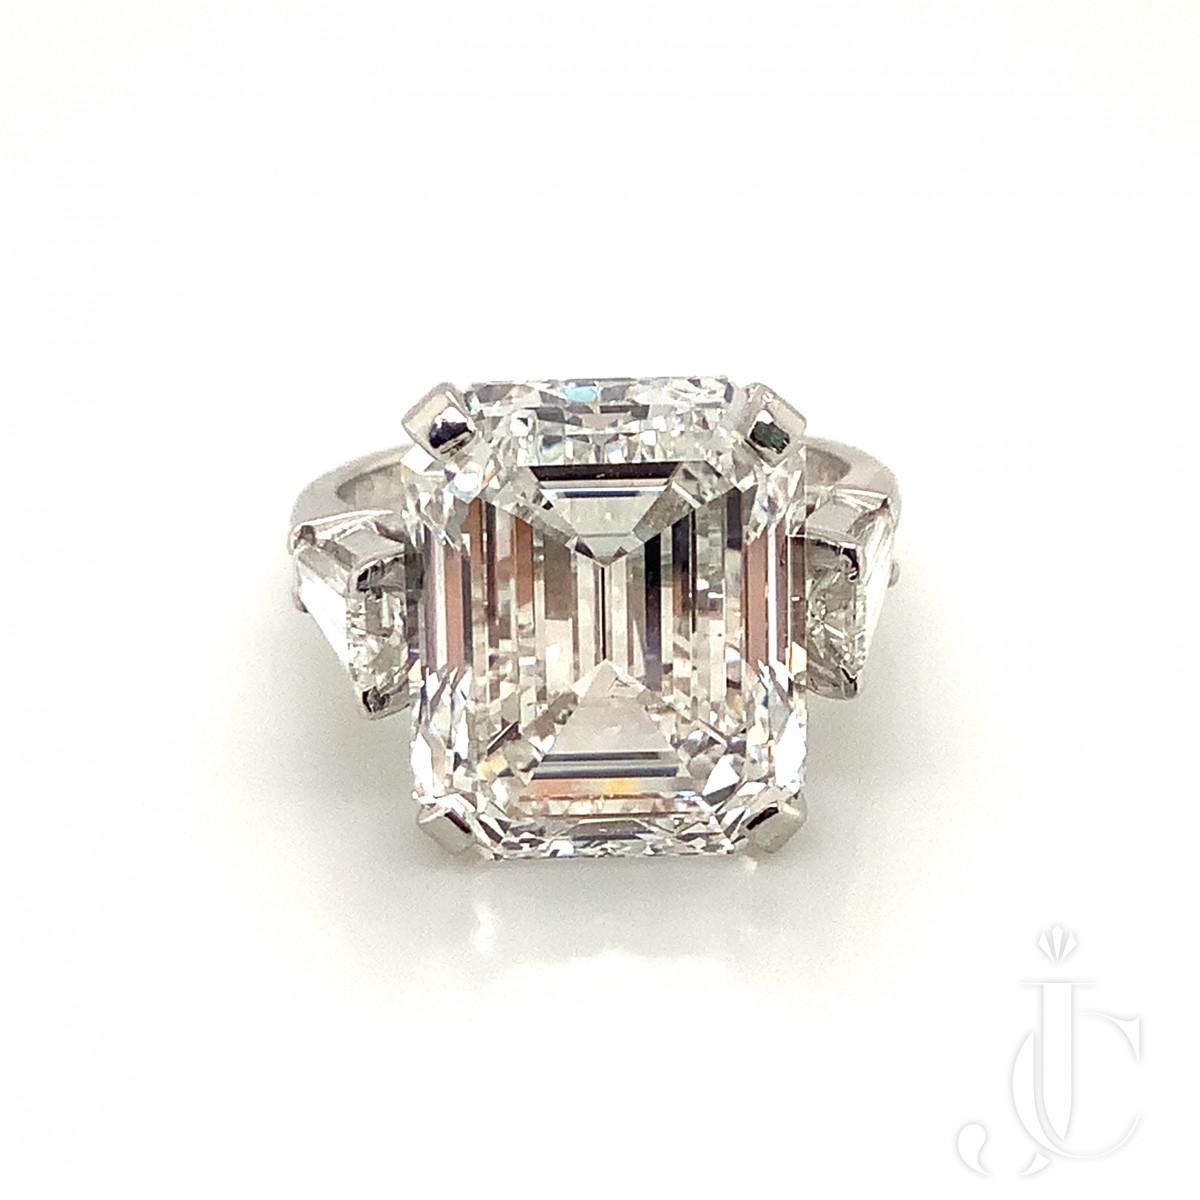 10.06ct Emerald Cut Diamond Ring